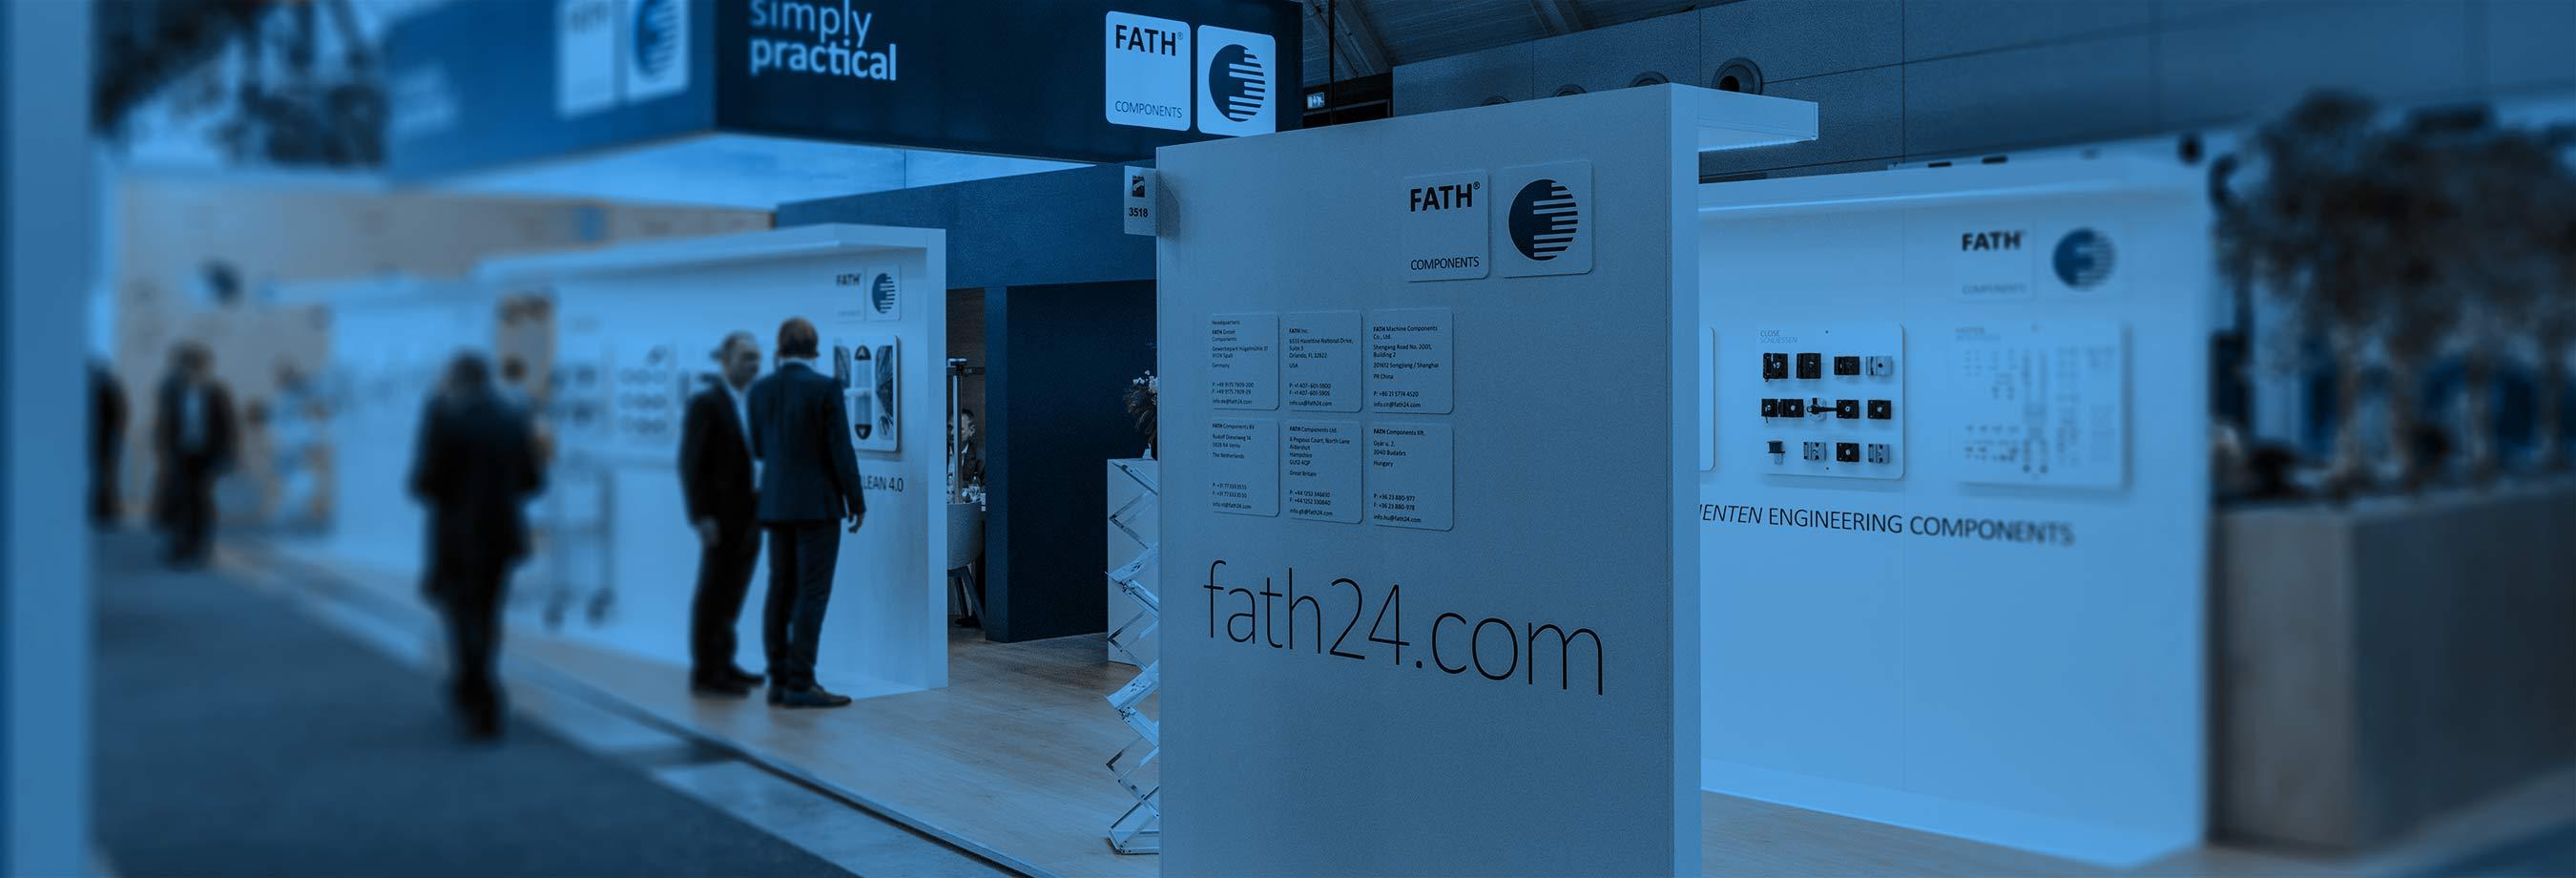 2020-03-03-FATH-header-trade-fairs-overview-2700x920-24-132kb